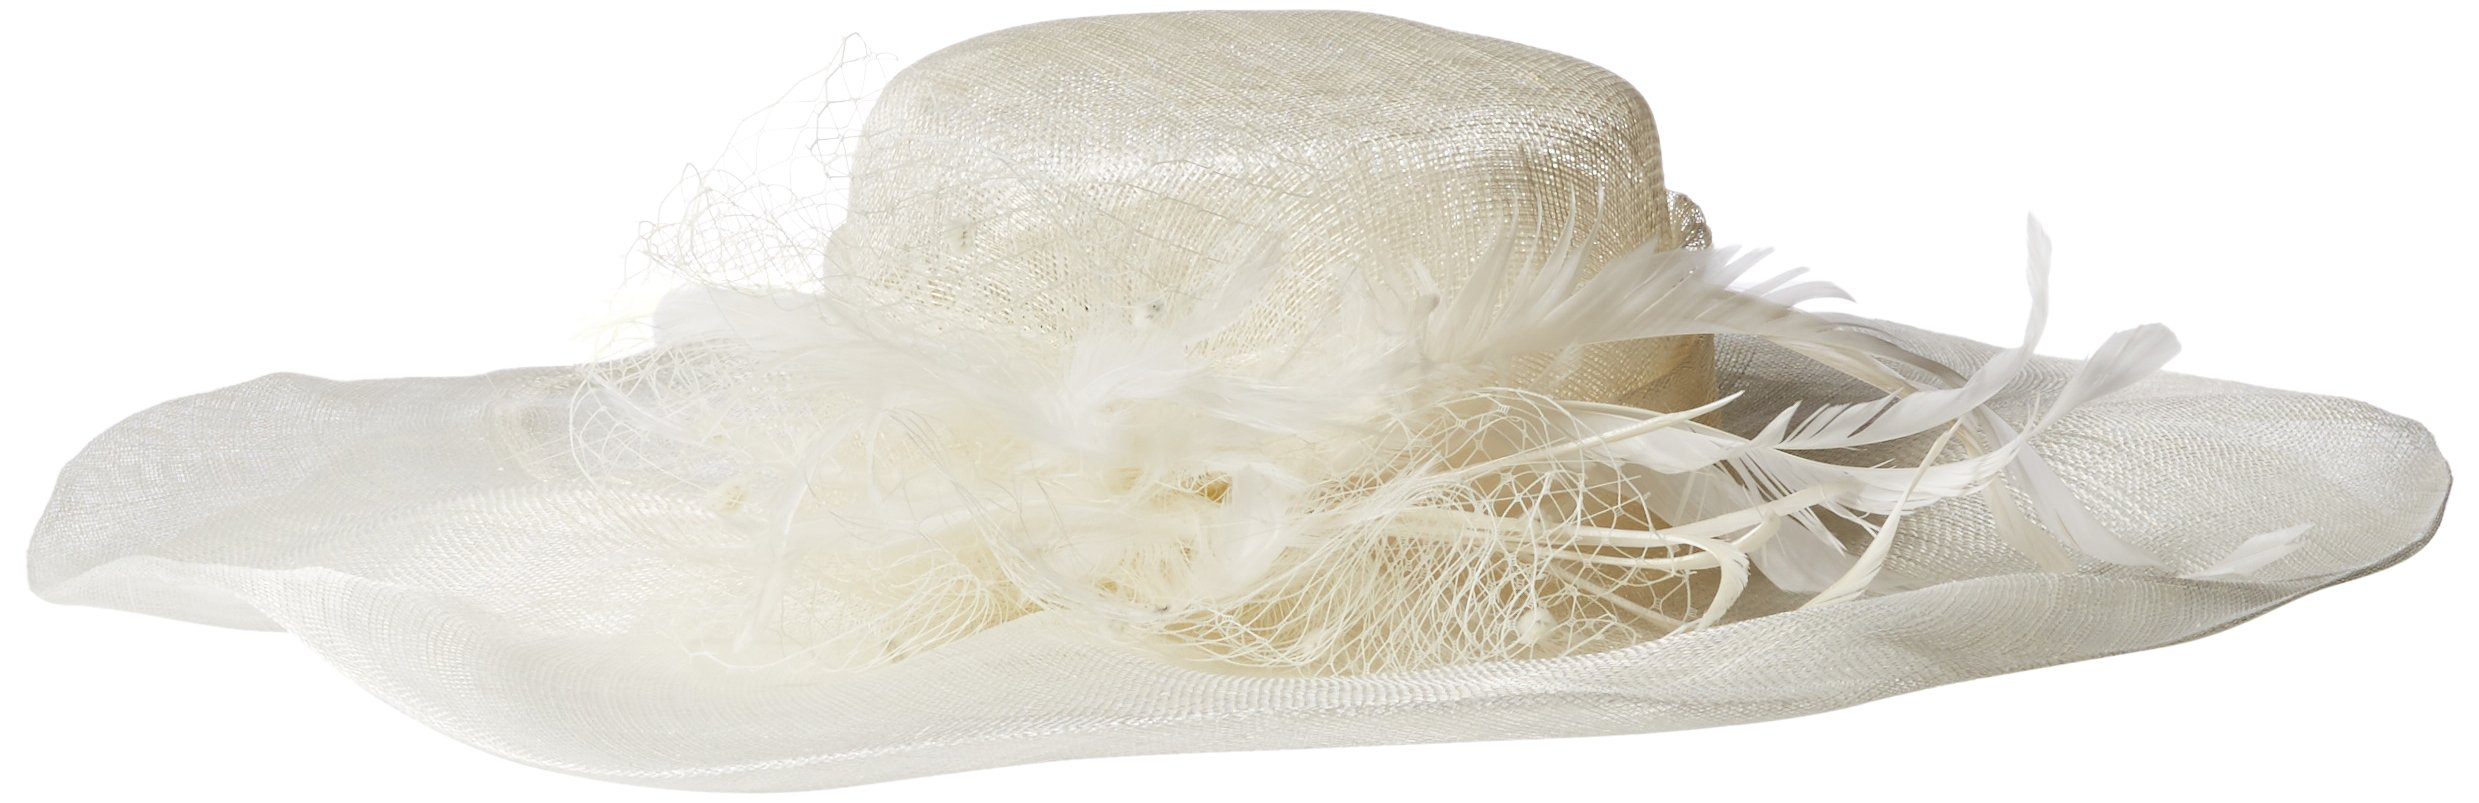 Scala Women's Solid Big Brim Sinamay Hat, Ivory, One Size by Scala